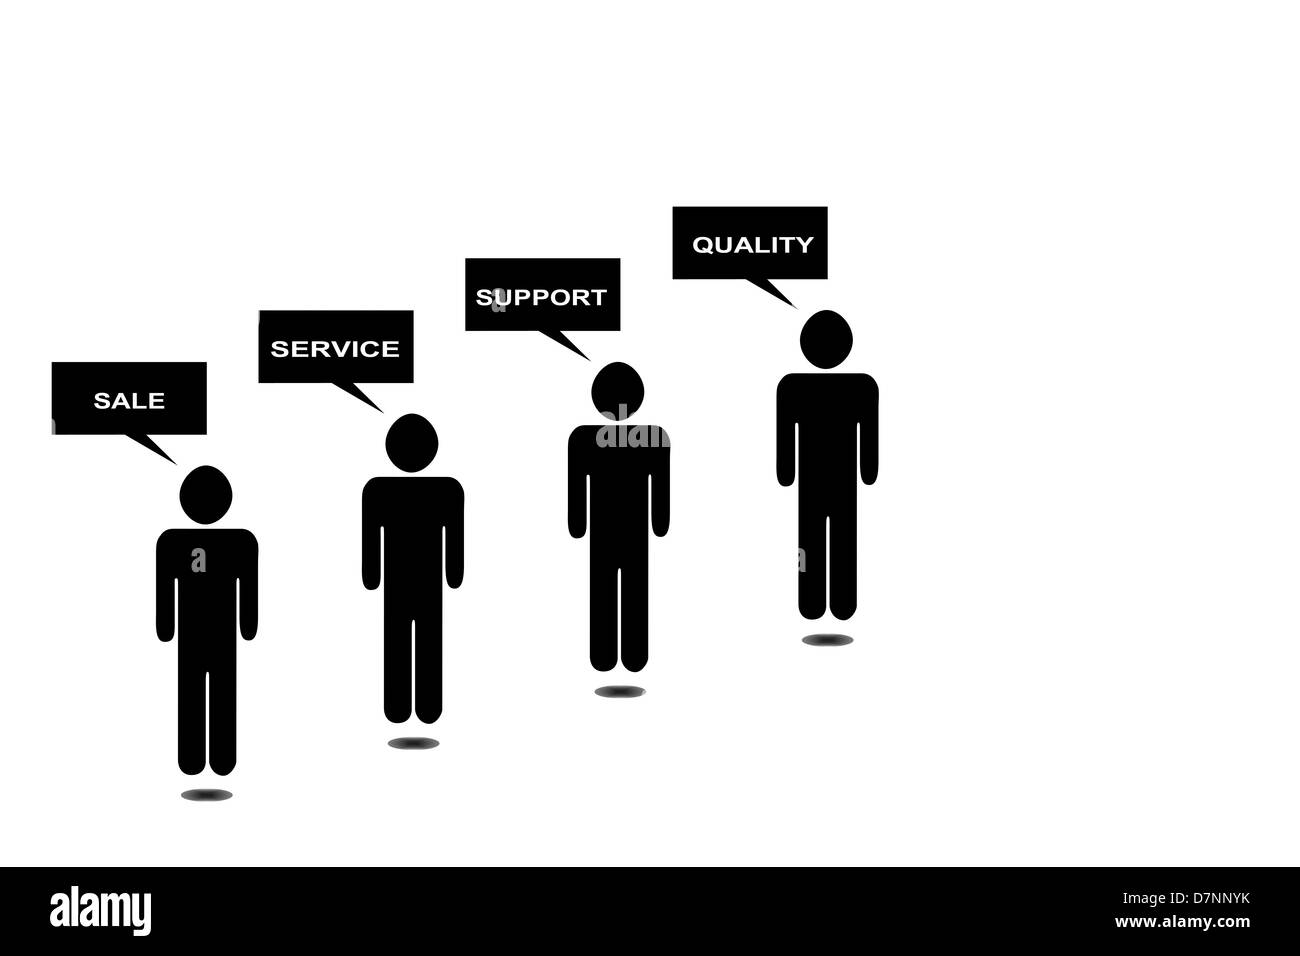 marketing symbol - Stock Image